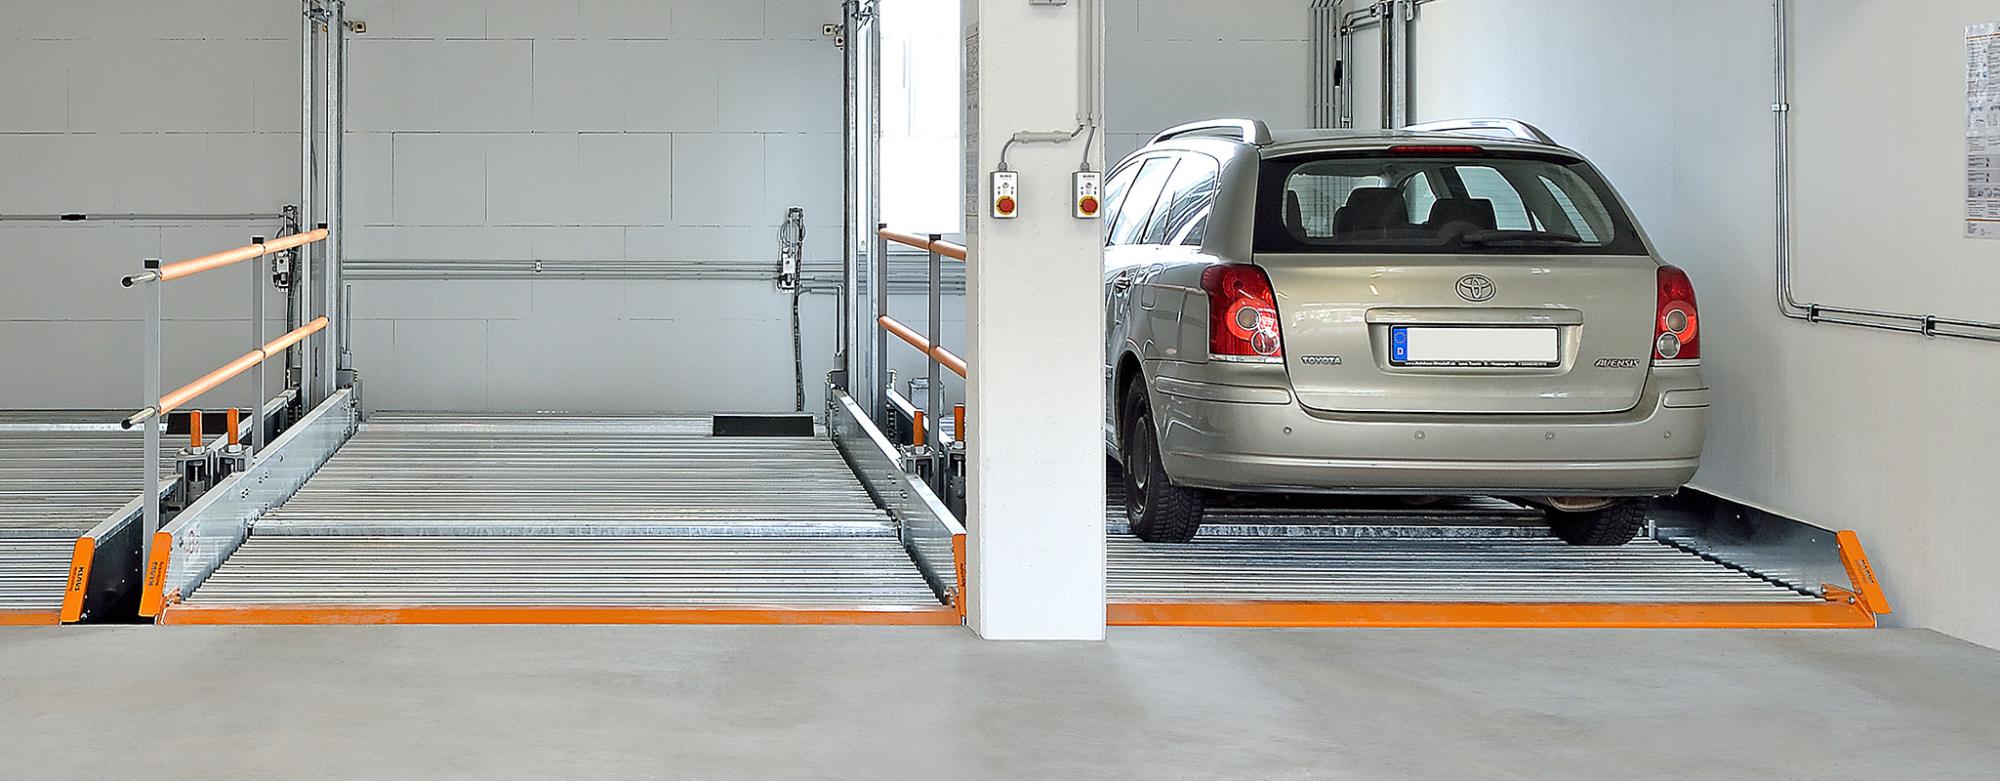 Premium Car Parking Solutions For The Digital Age Klaus Multiparking